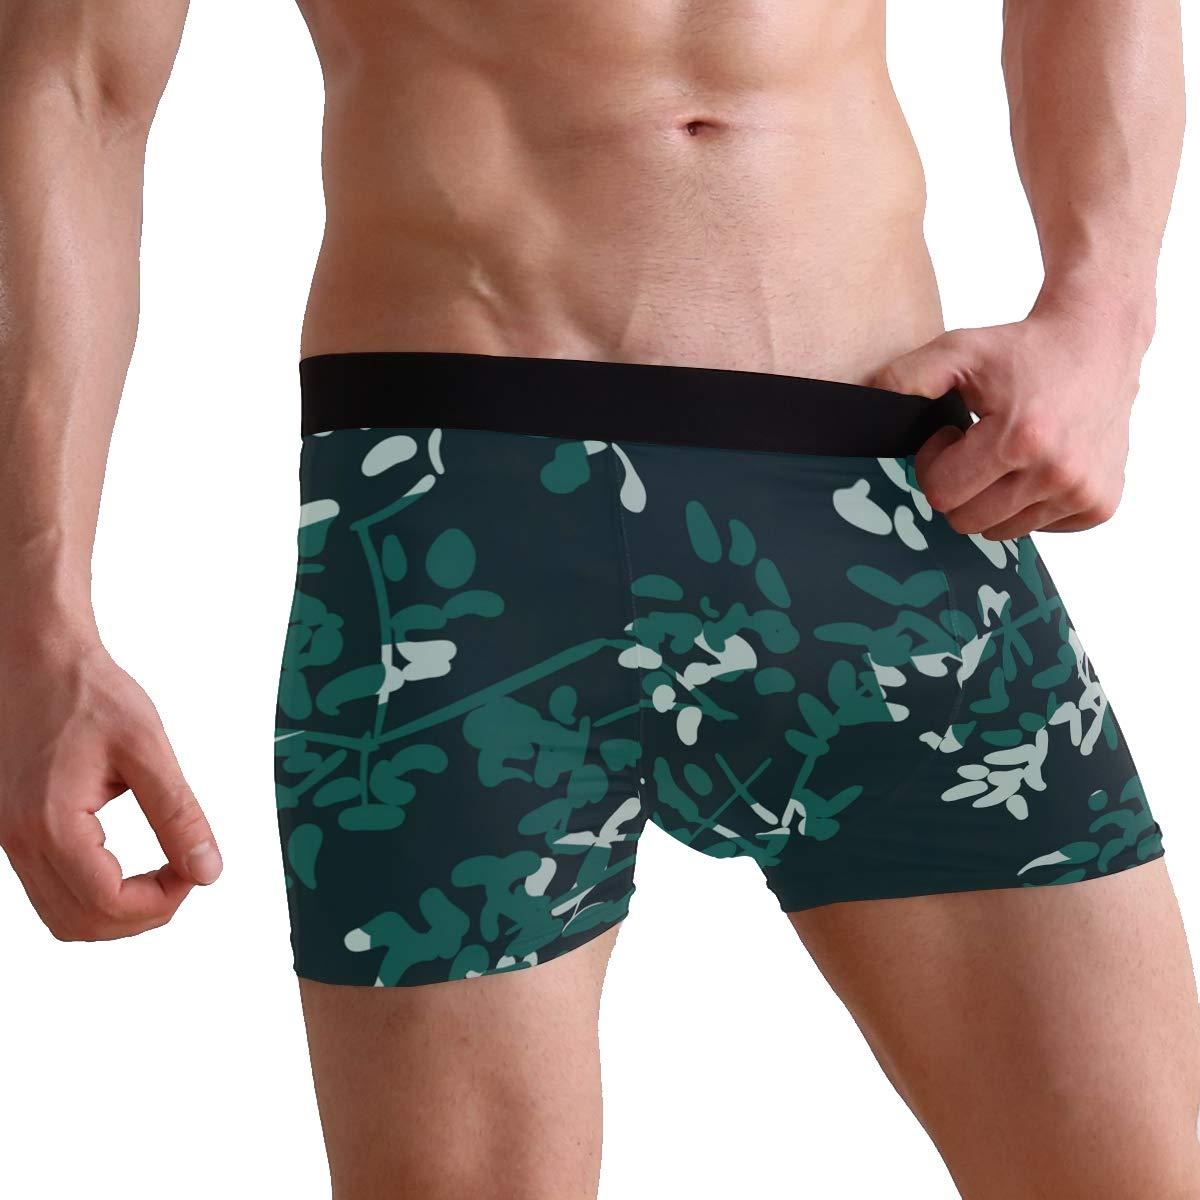 HULKBIDBV Mens underwearInk Flower Sketch Leaves Polyester